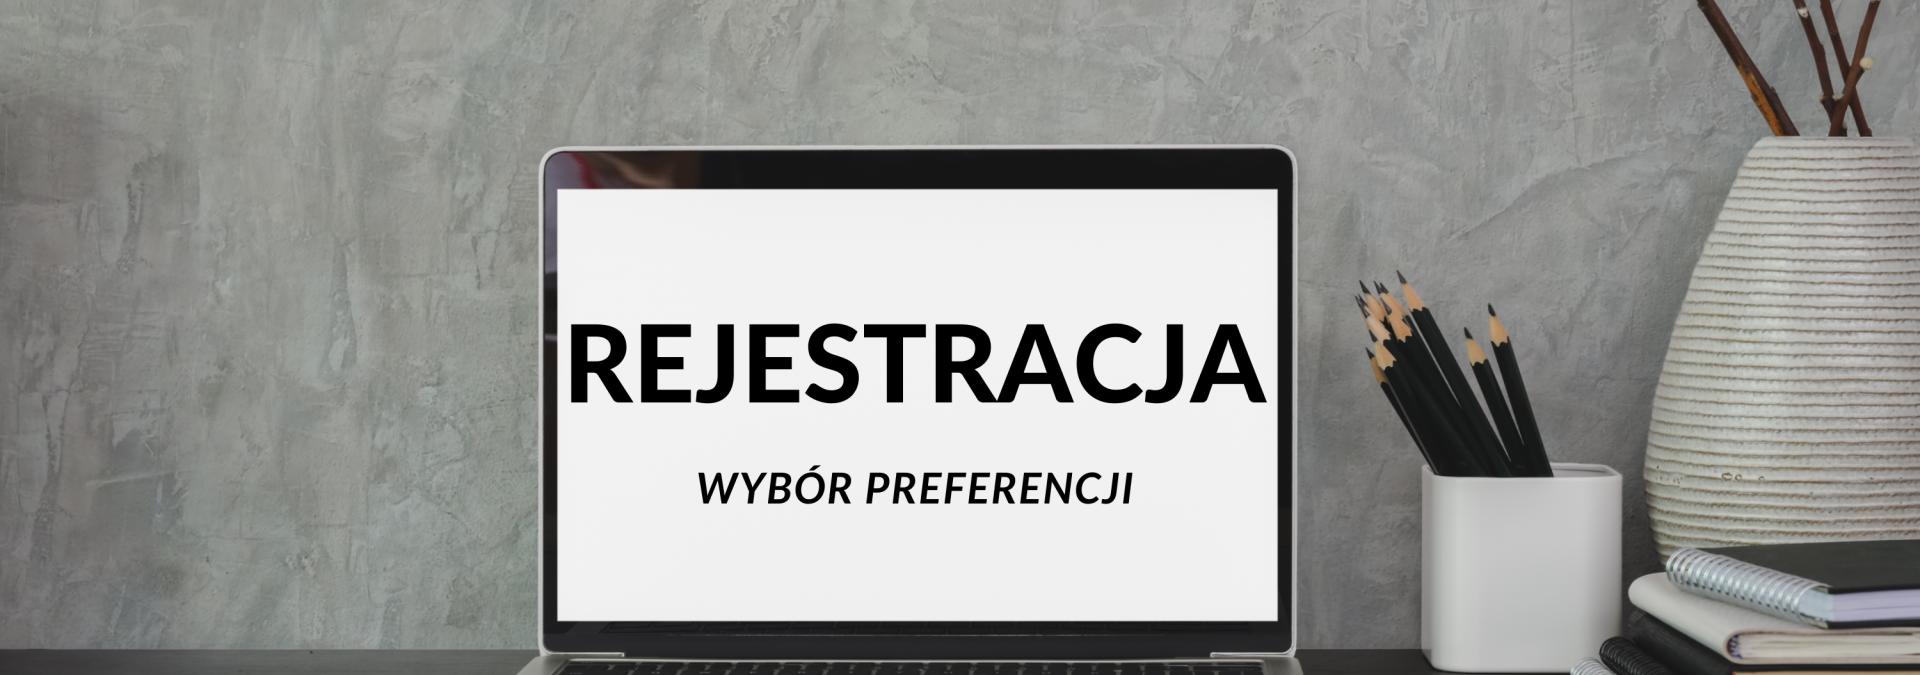 rekrutacja-rejestracja-preferencje